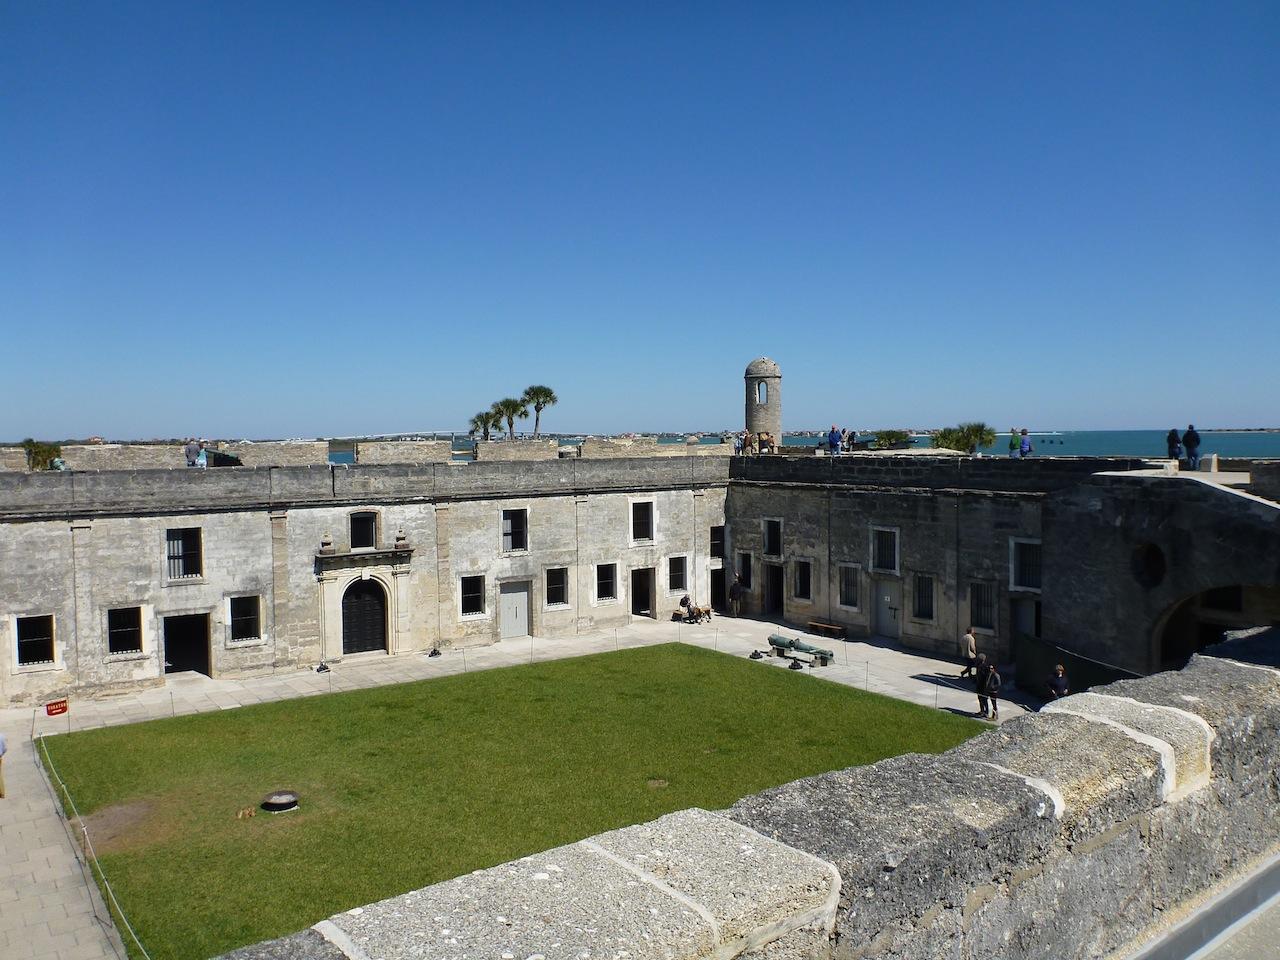 The Center Courtyard Of Castillo de San Marcos In St. Augustine